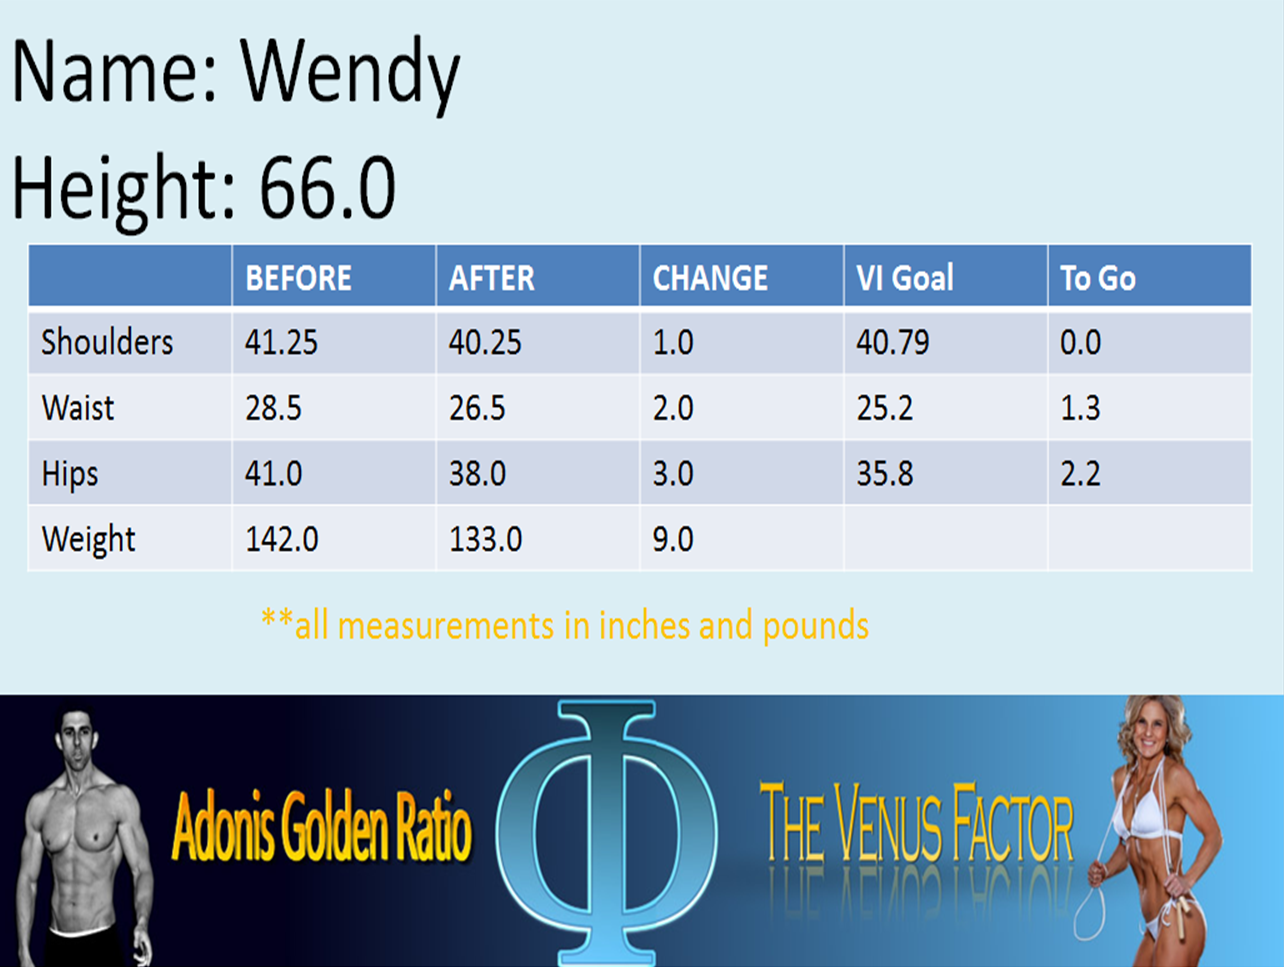 Wendy's metrics change